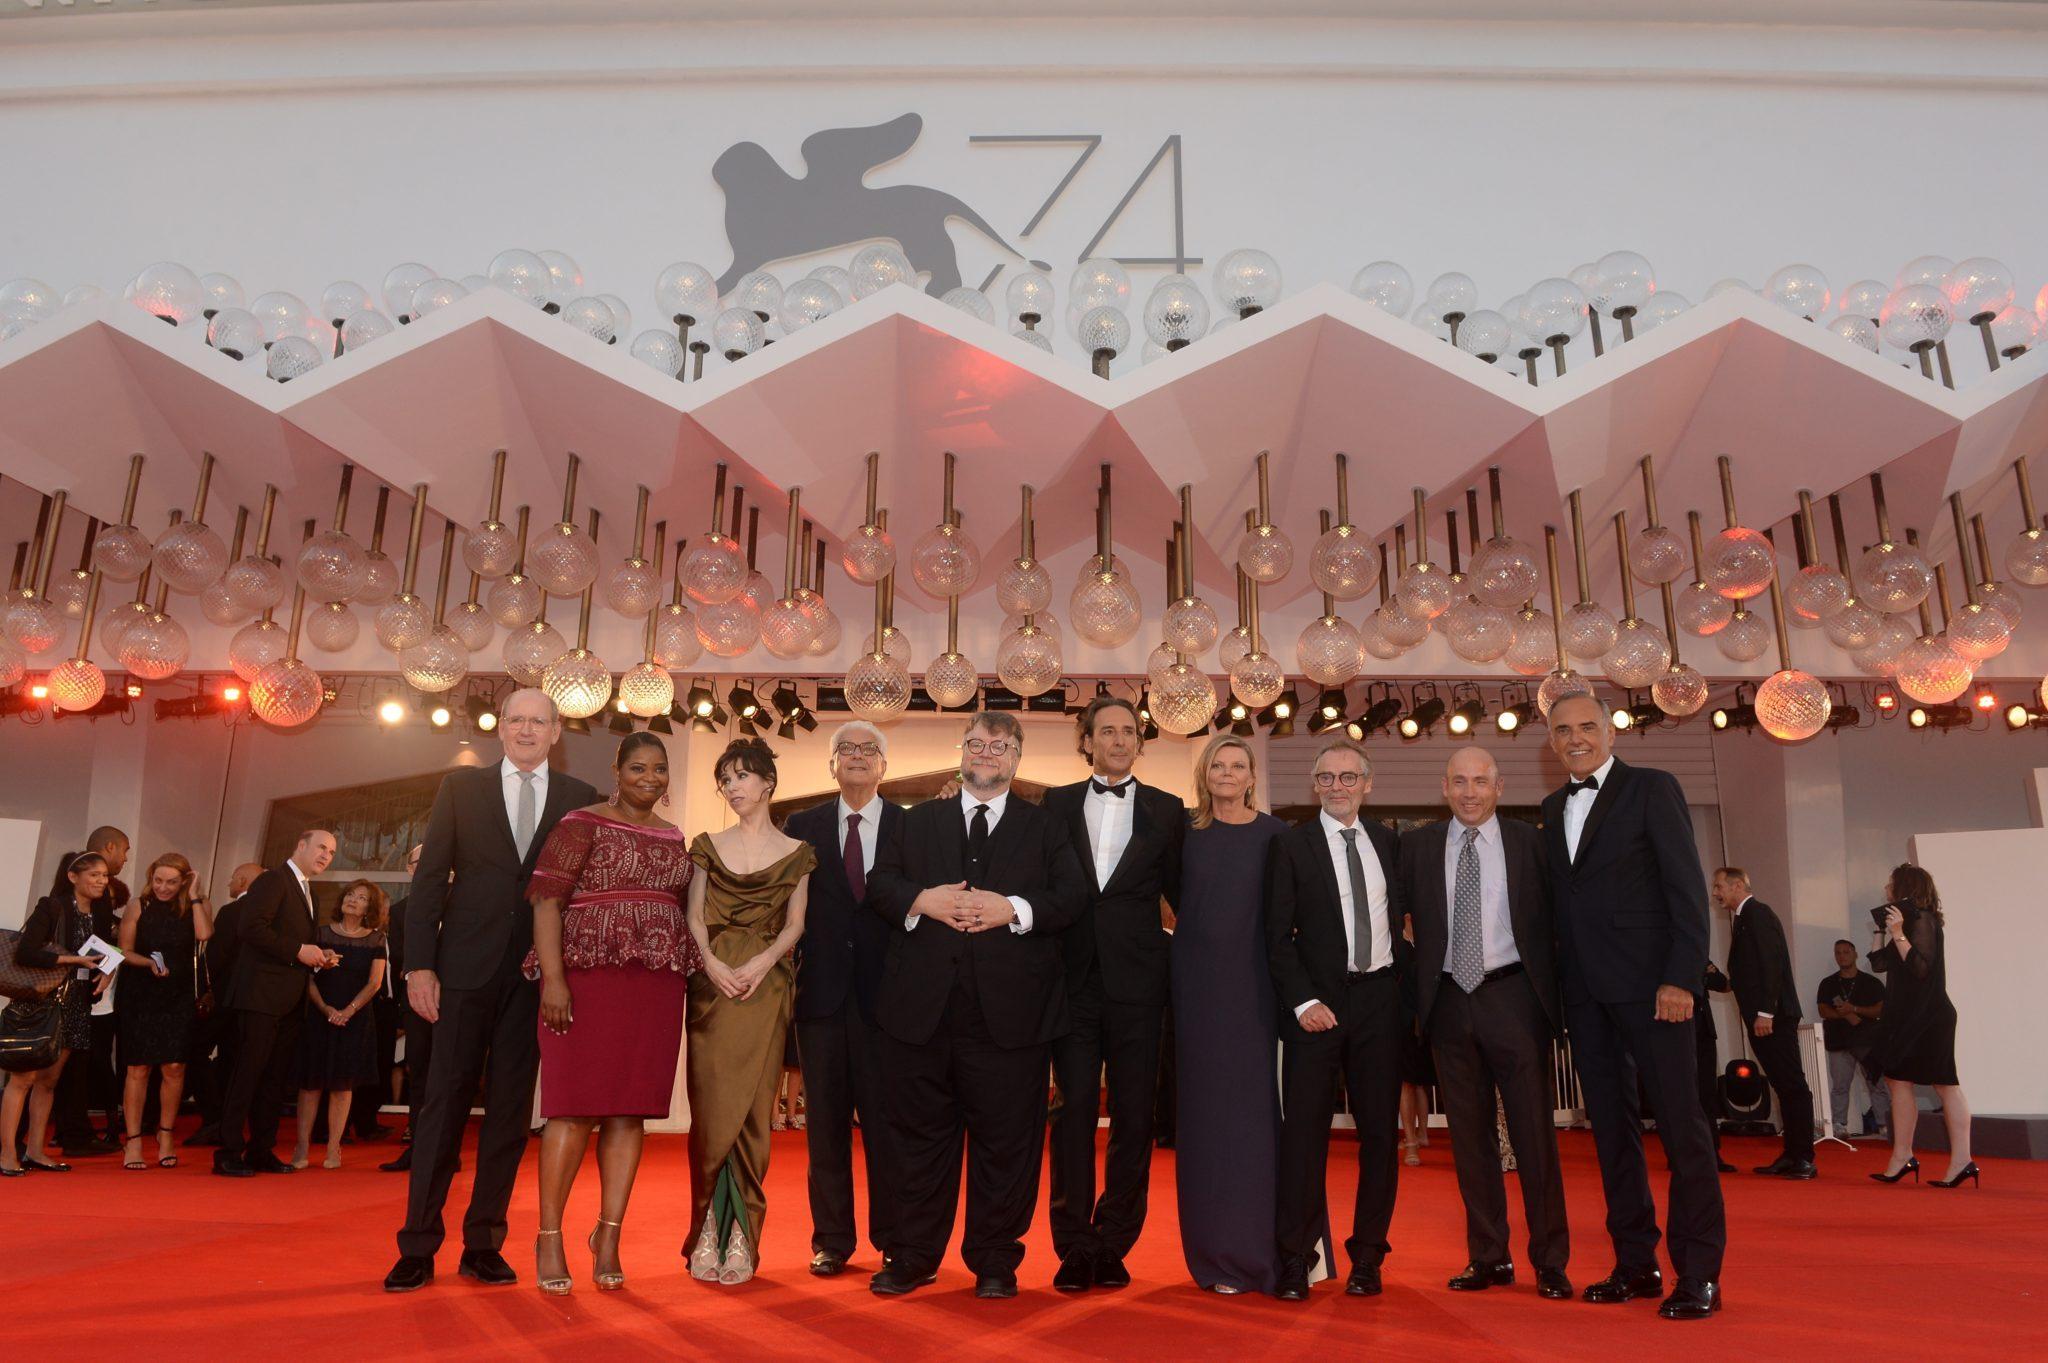 La Forme de l'eau Guillermo del Toro image Mostra de Venise 2017